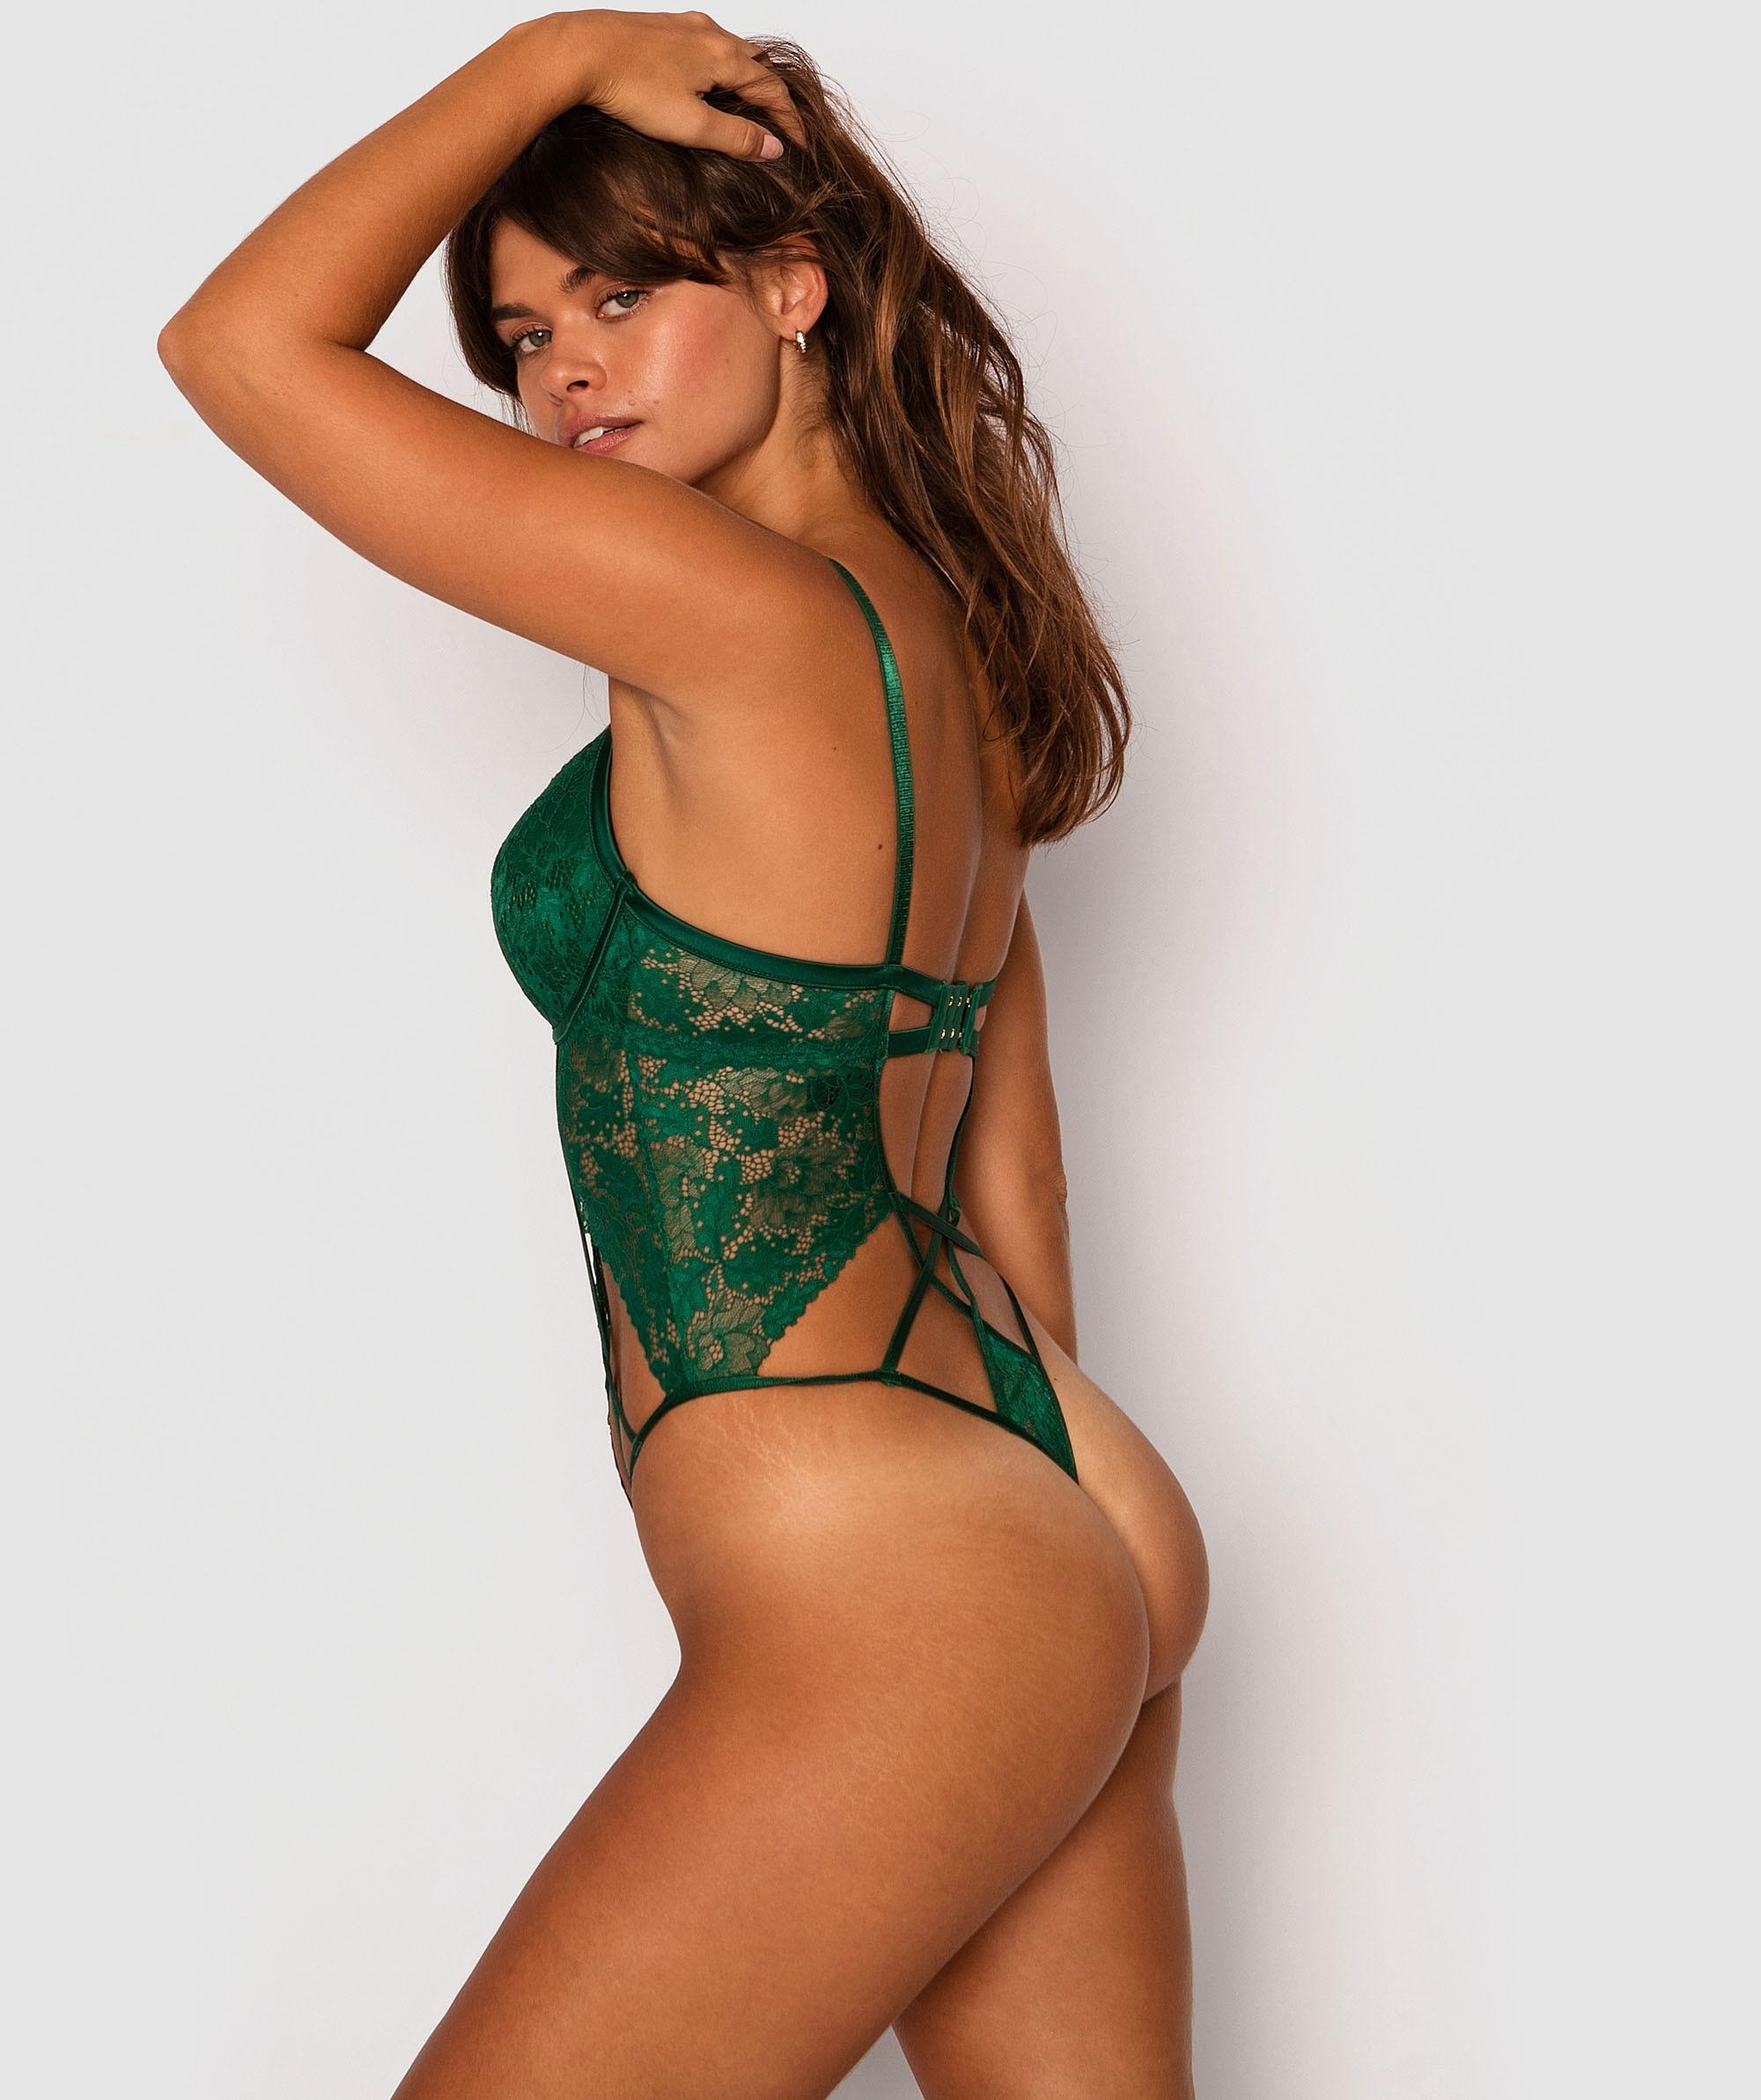 Shamrock Push Up Bodysuit - Dark Green